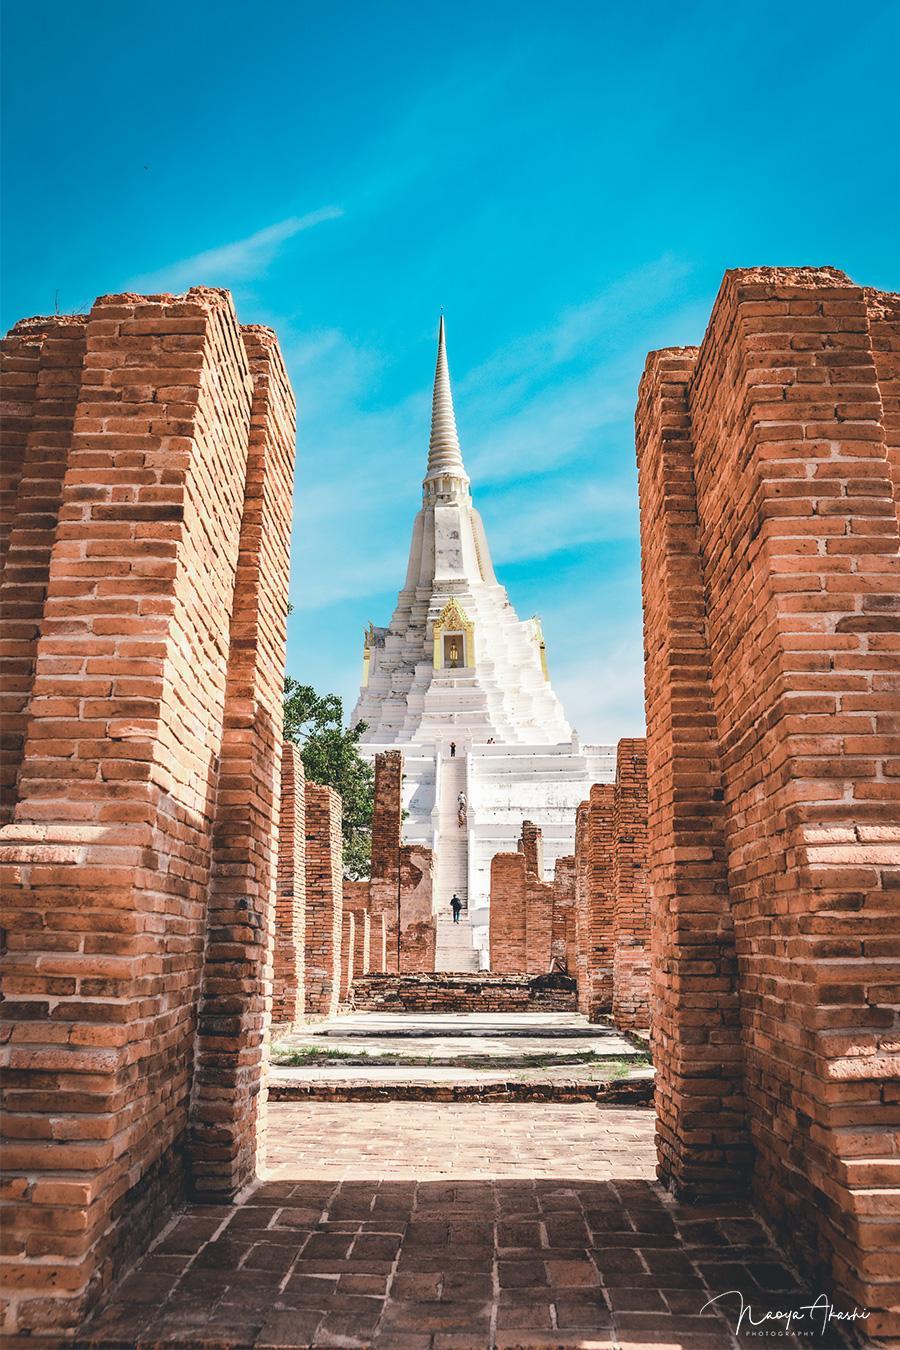 Phu Khao Thong